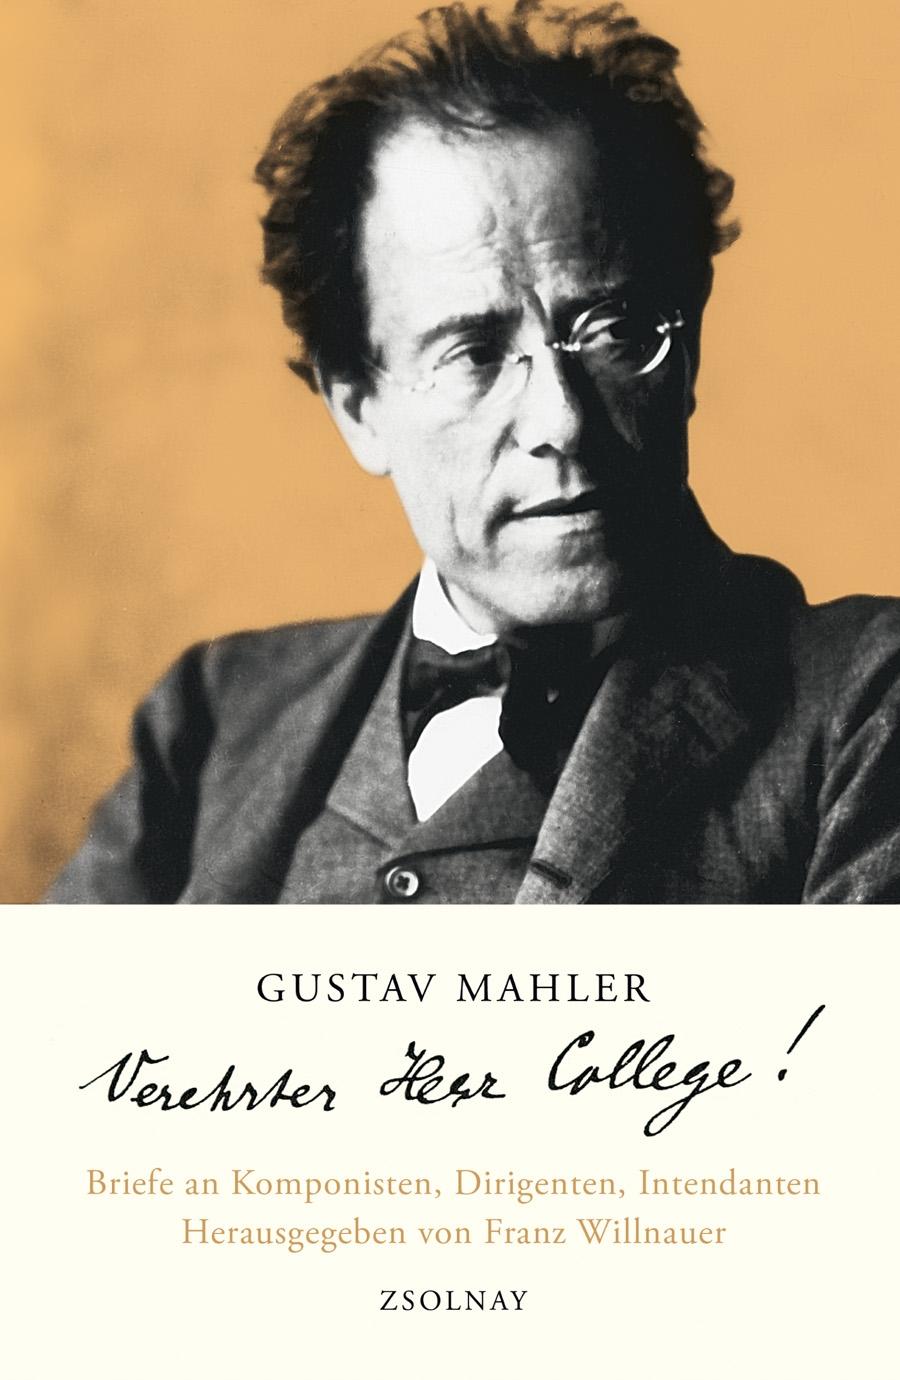 Gustav Mahler My Esteemed Colleague!